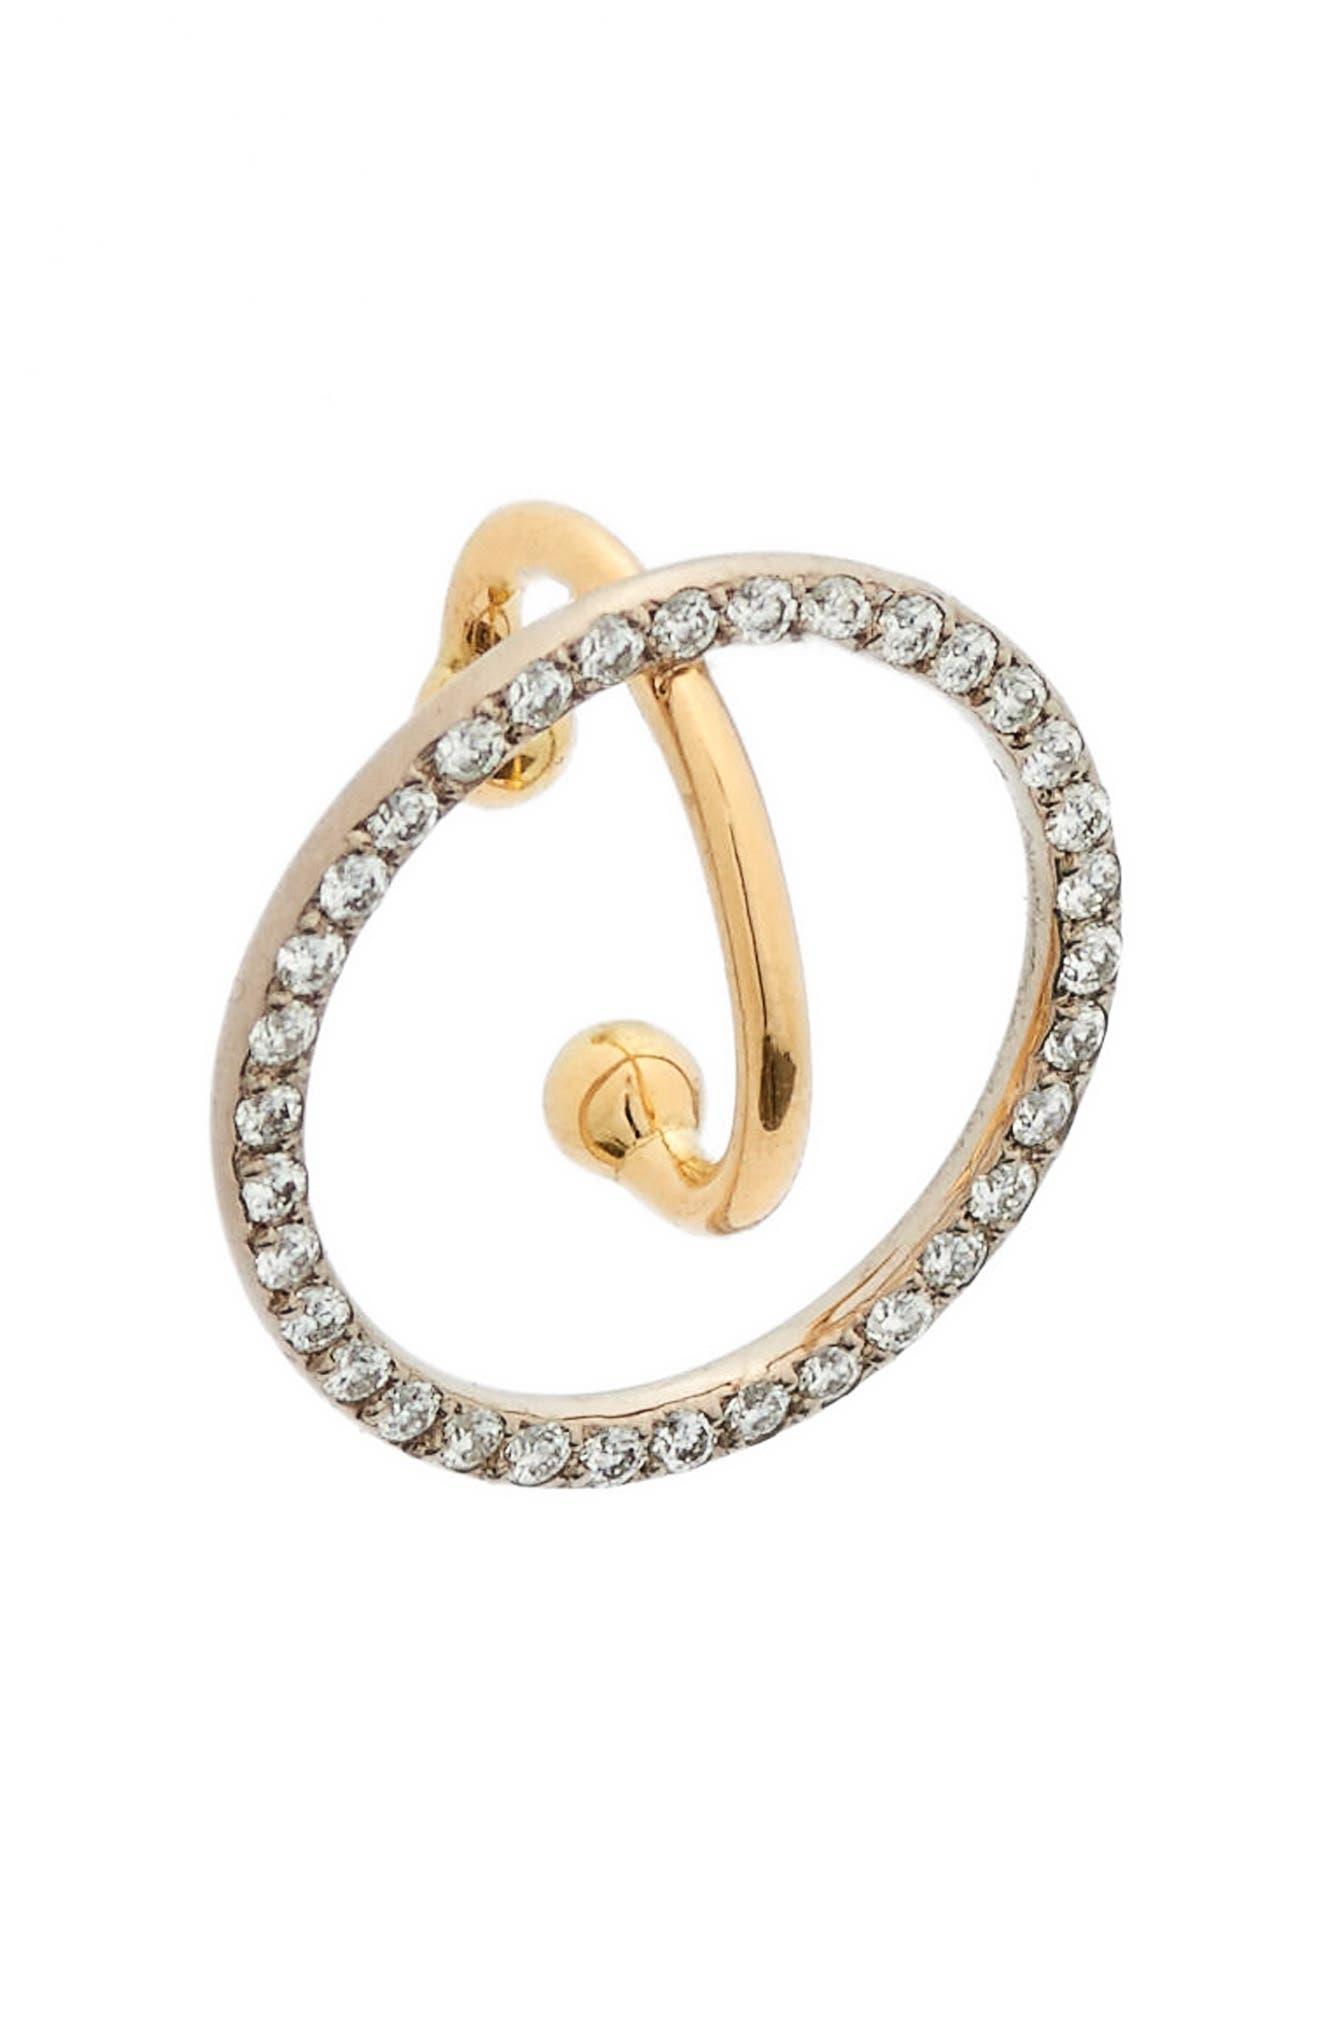 Celeste Diamond Earring,                         Main,                         color, Yellow White Gold Diamonds